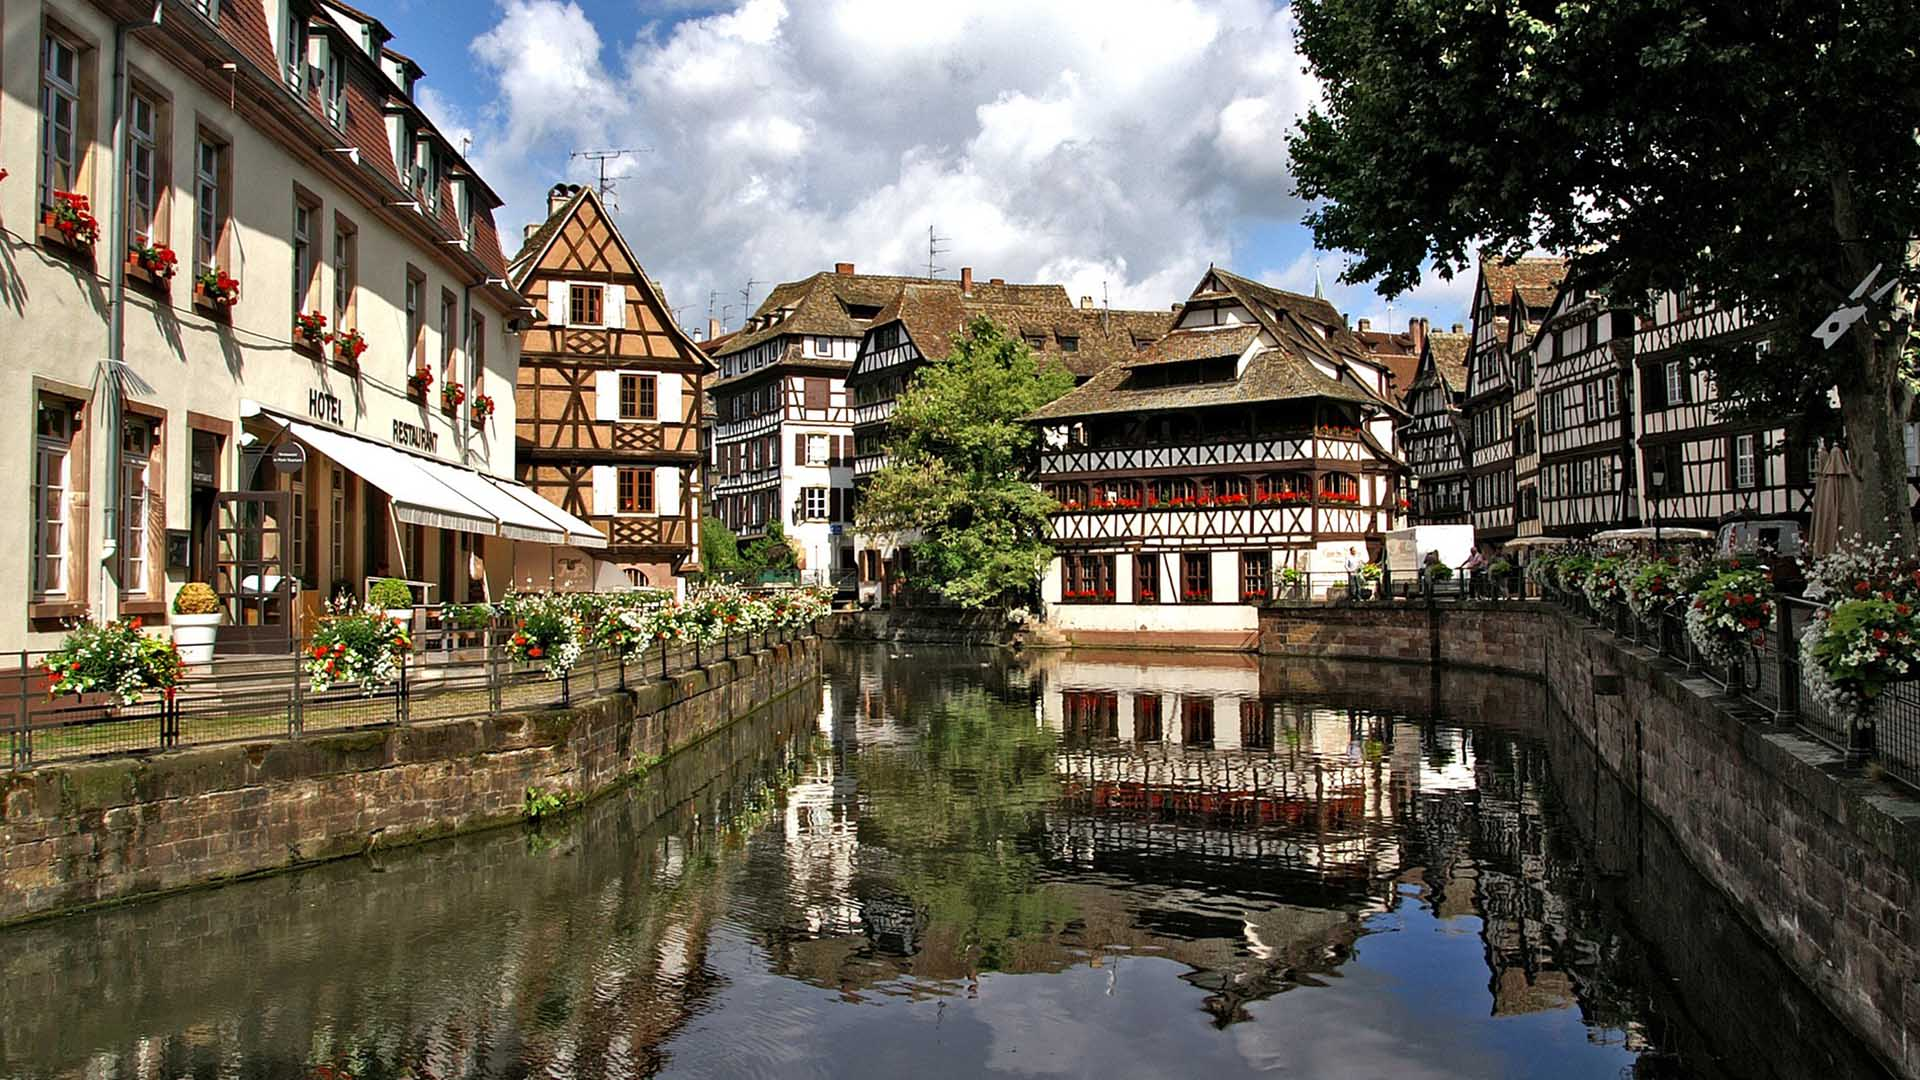 Ausflugsziel Strassbourg im Elsaß